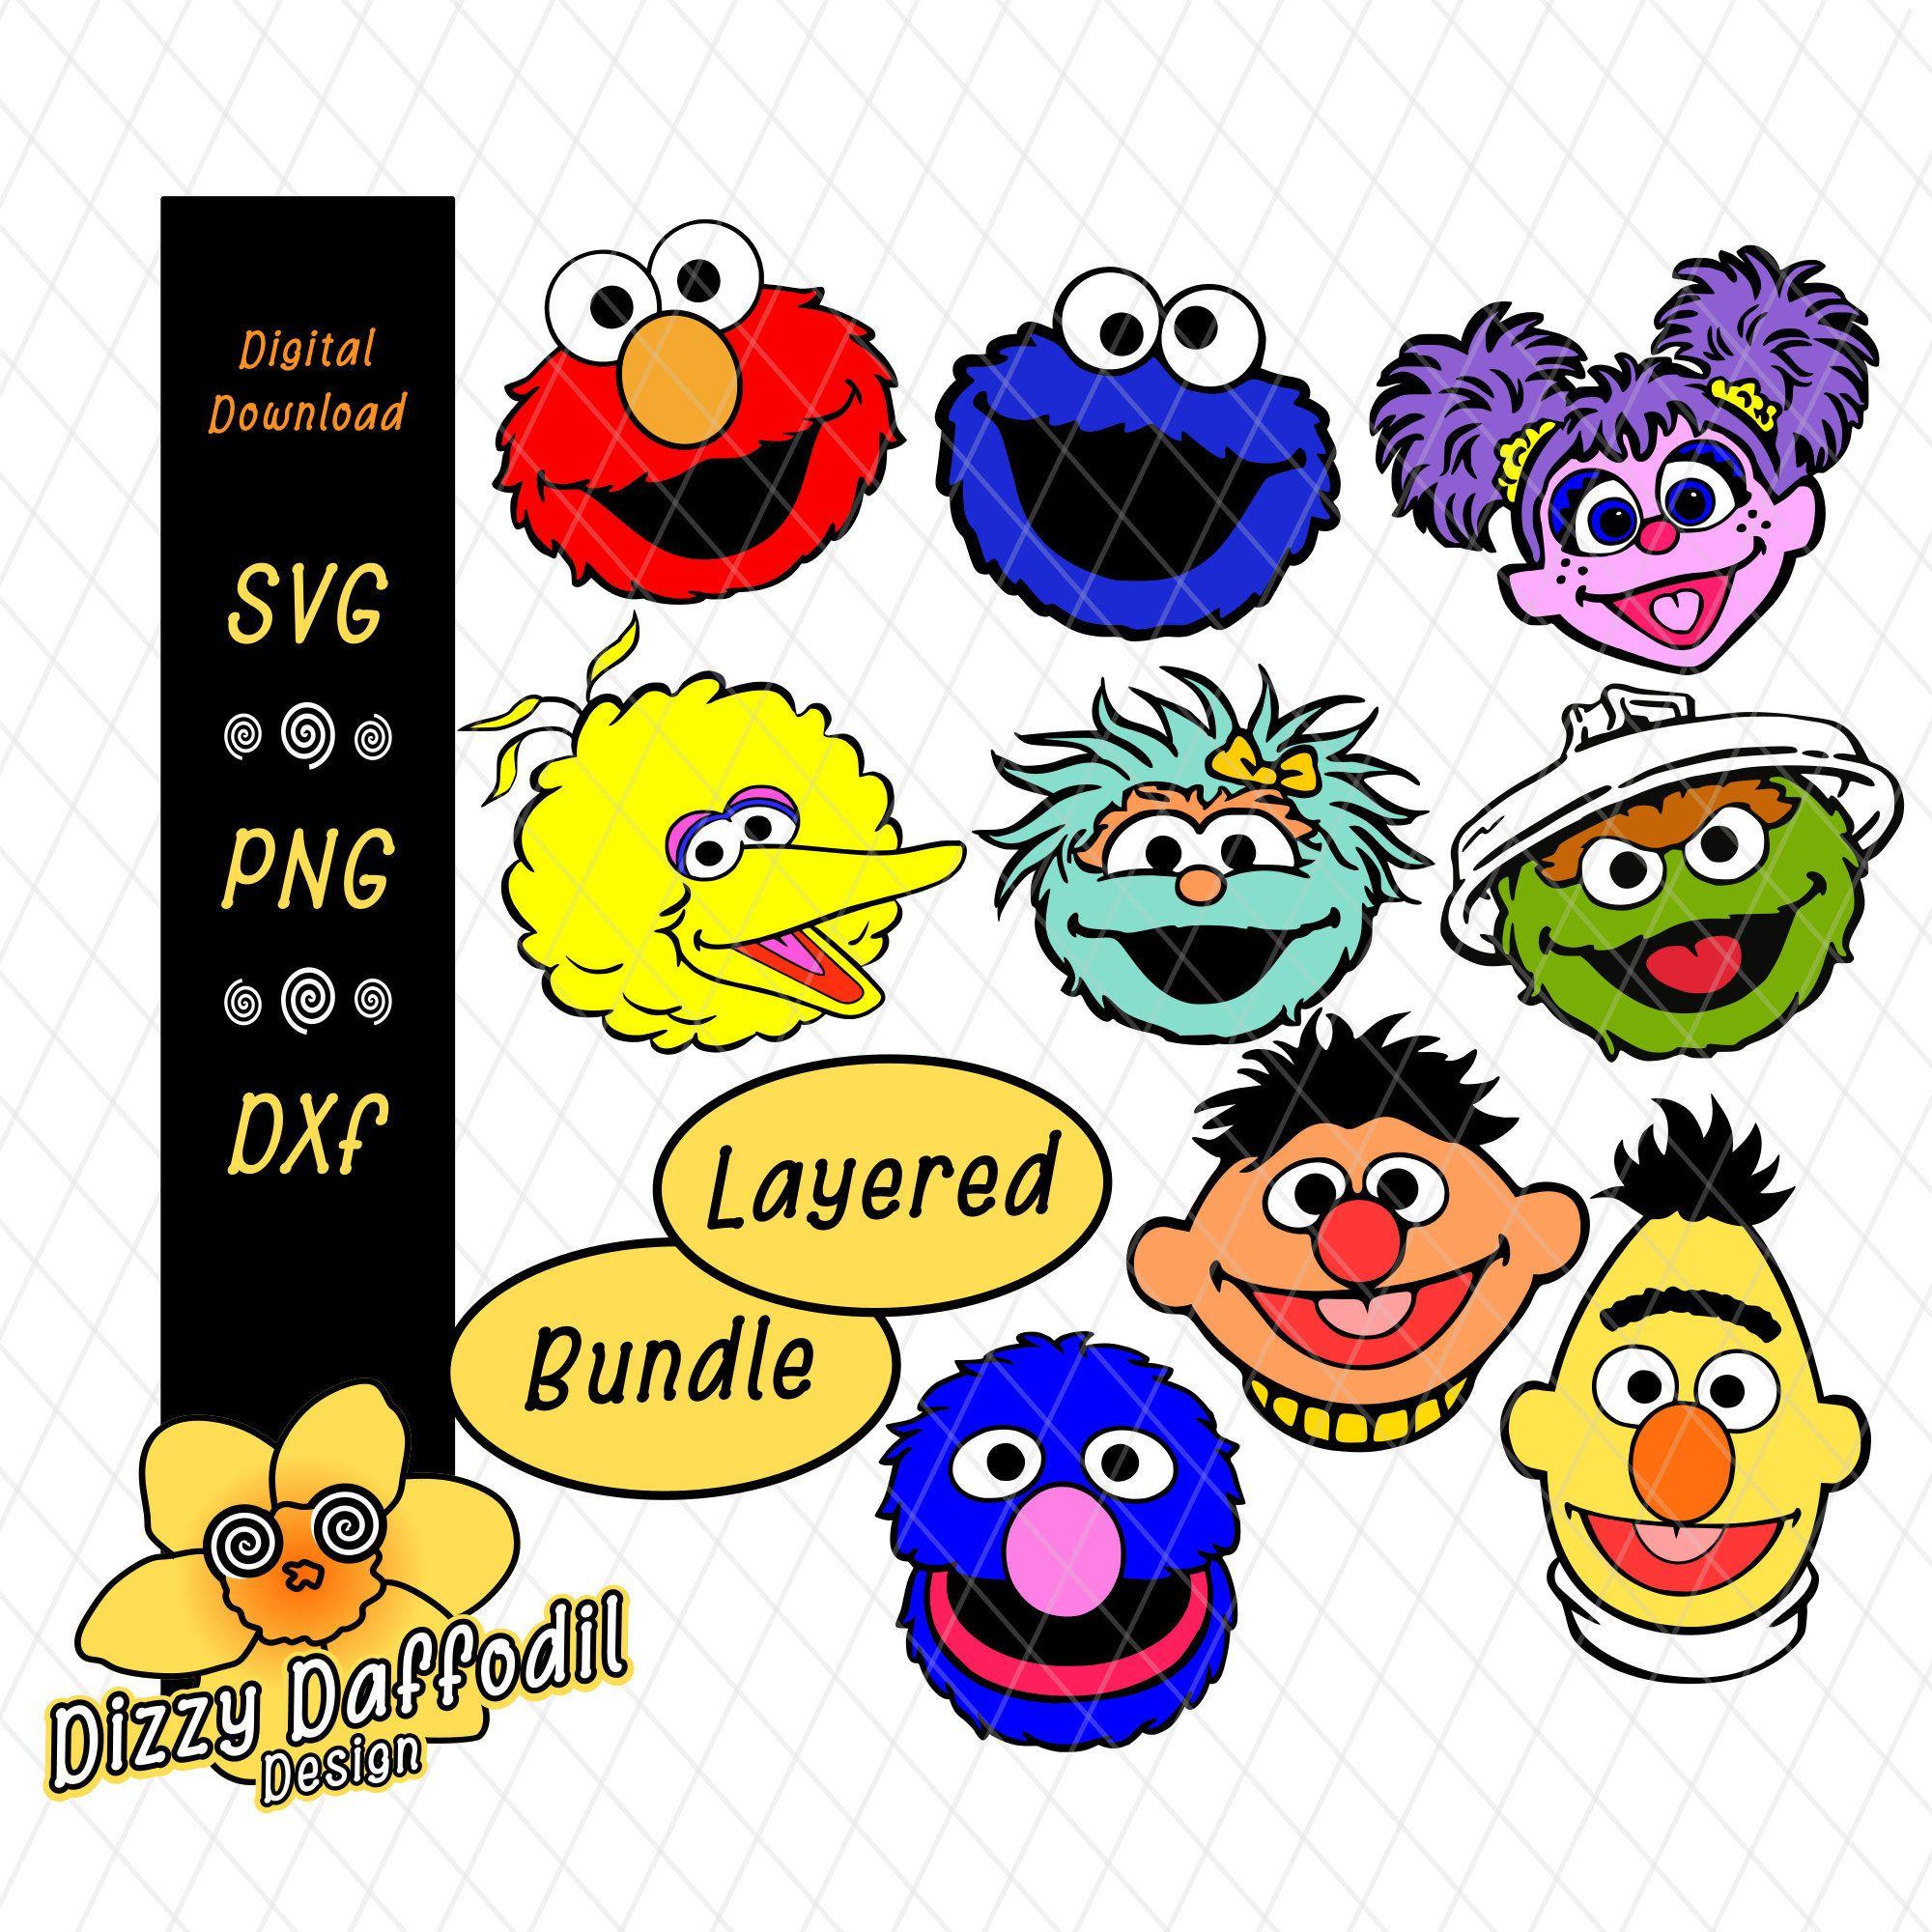 Sesame Street Face Head Bundle Svg Dxf Sesame Street Layered Design Digital Download Elmo Cookie Sesame Street Party Printables Free Sesame Street Birthday